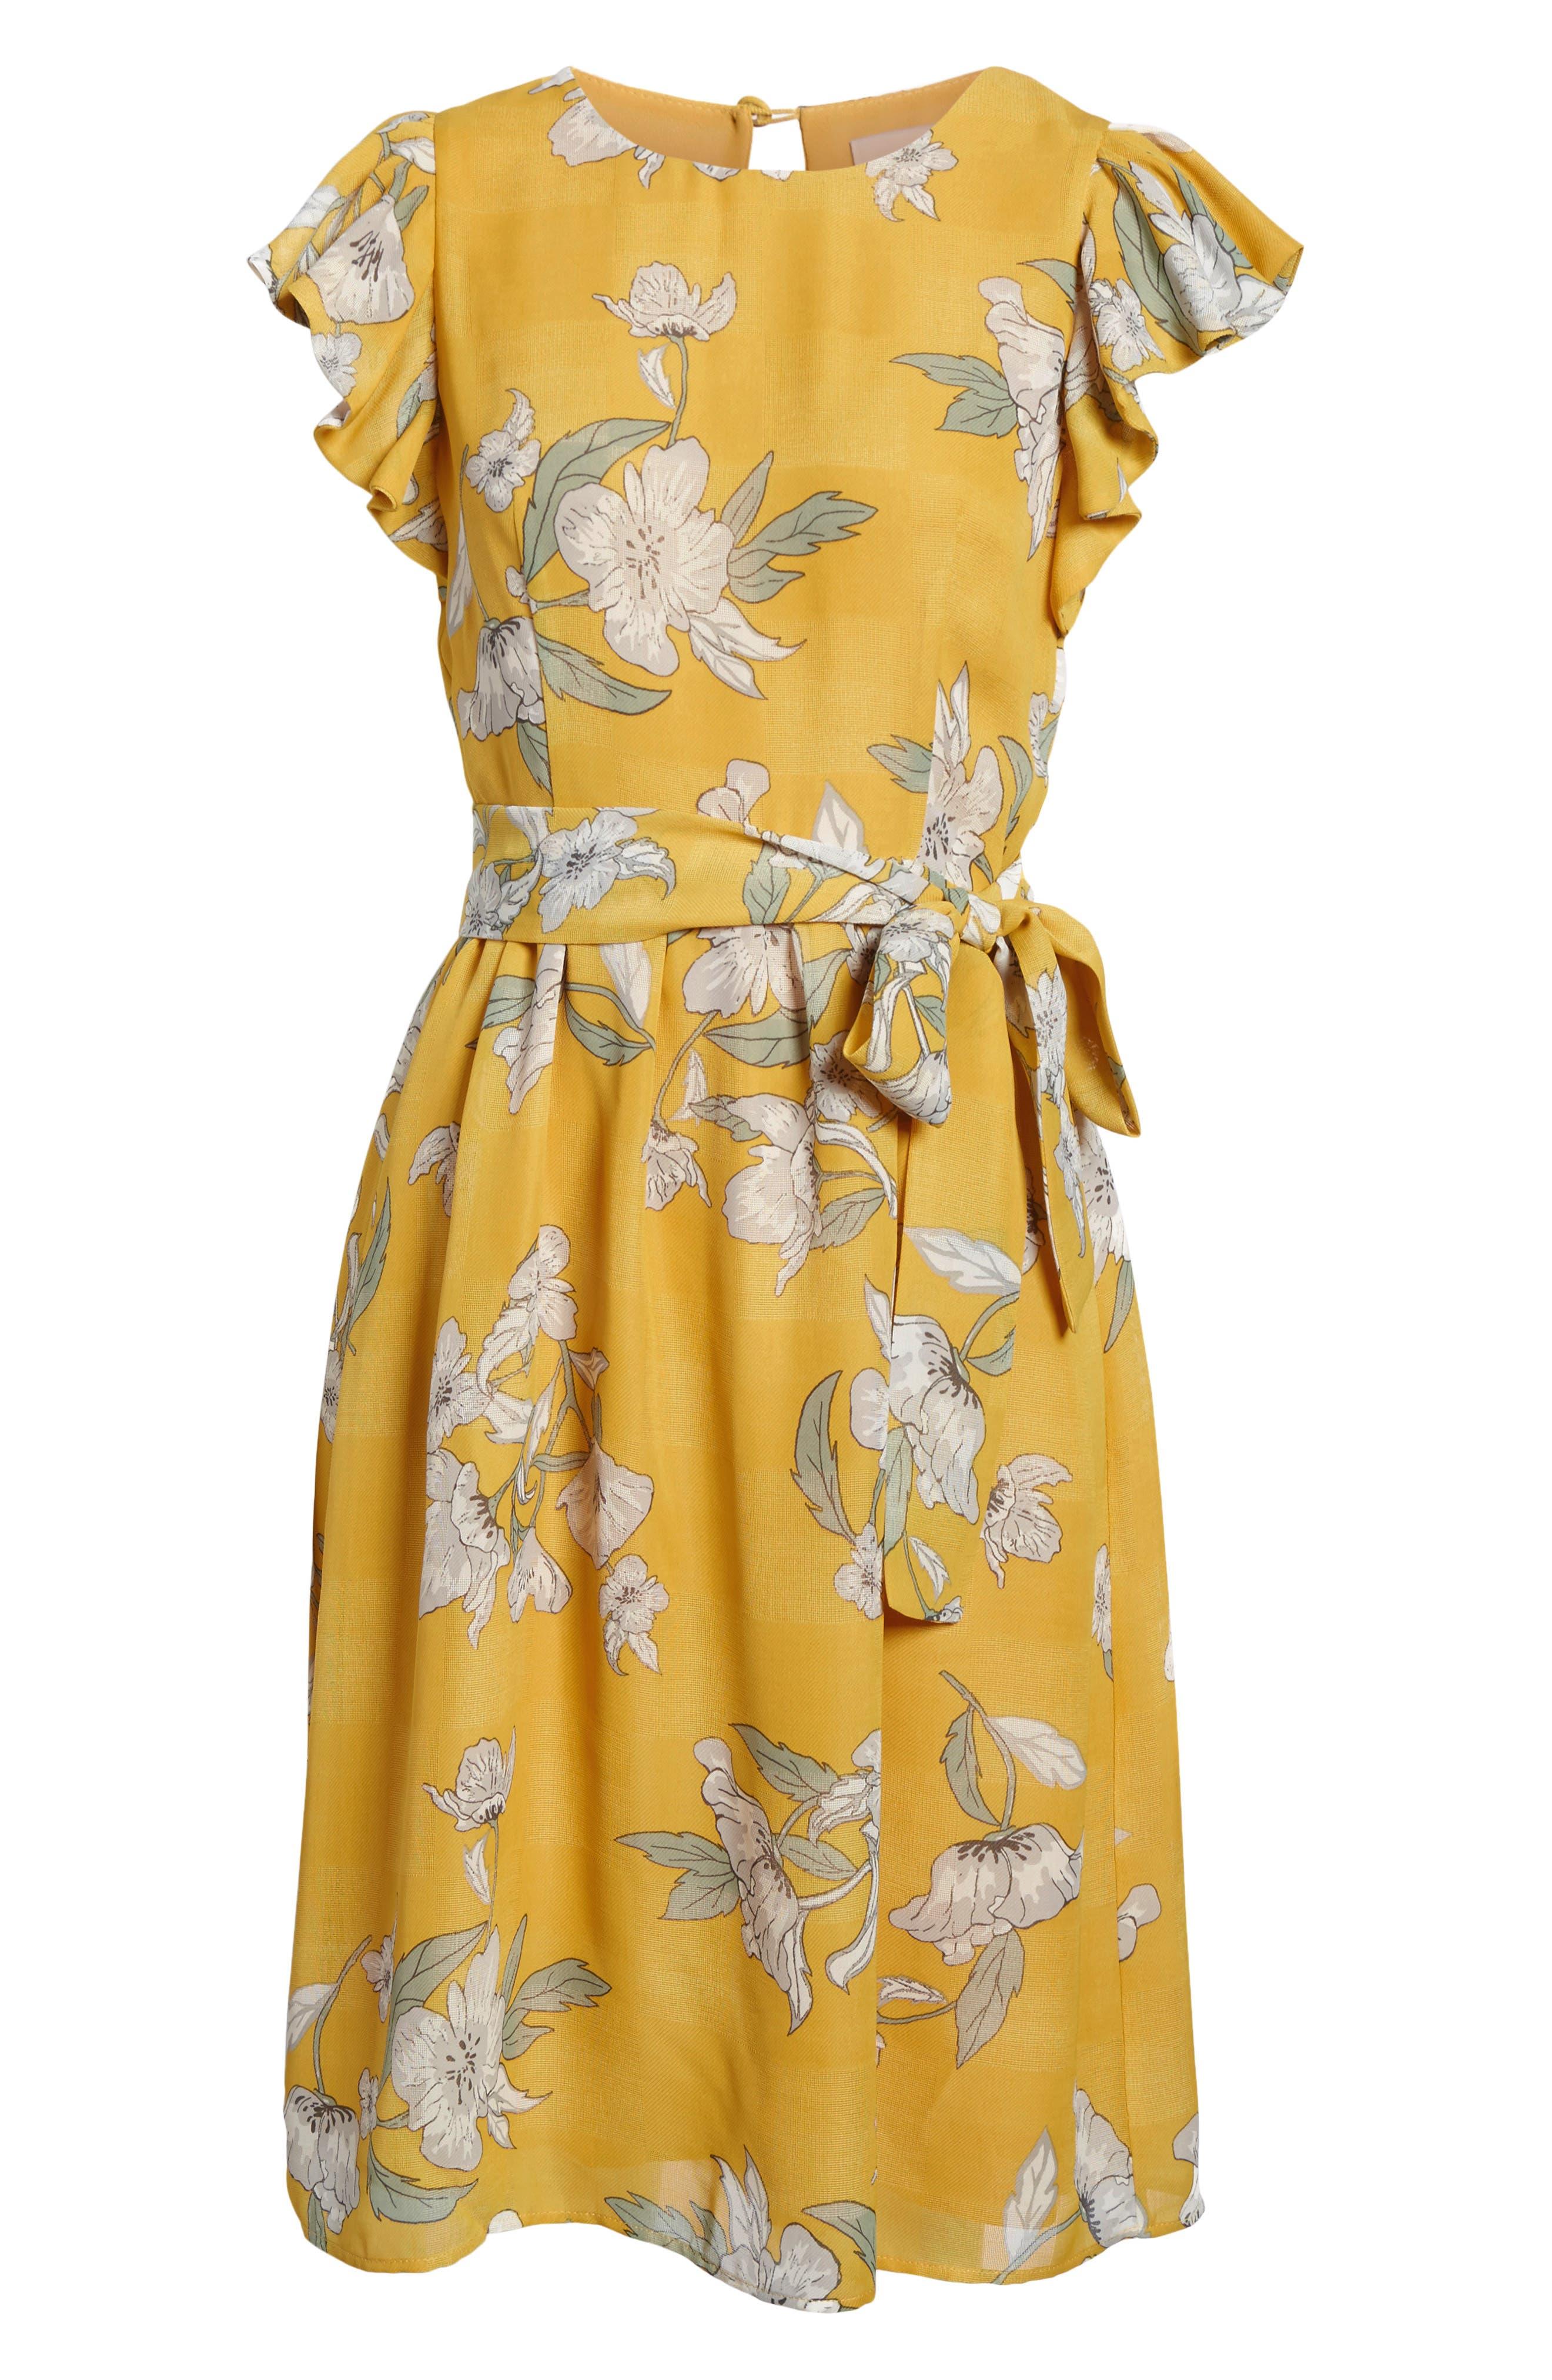 Chriselle x J.O.A. Fit & Flare Dress,                             Alternate thumbnail 7, color,                             700